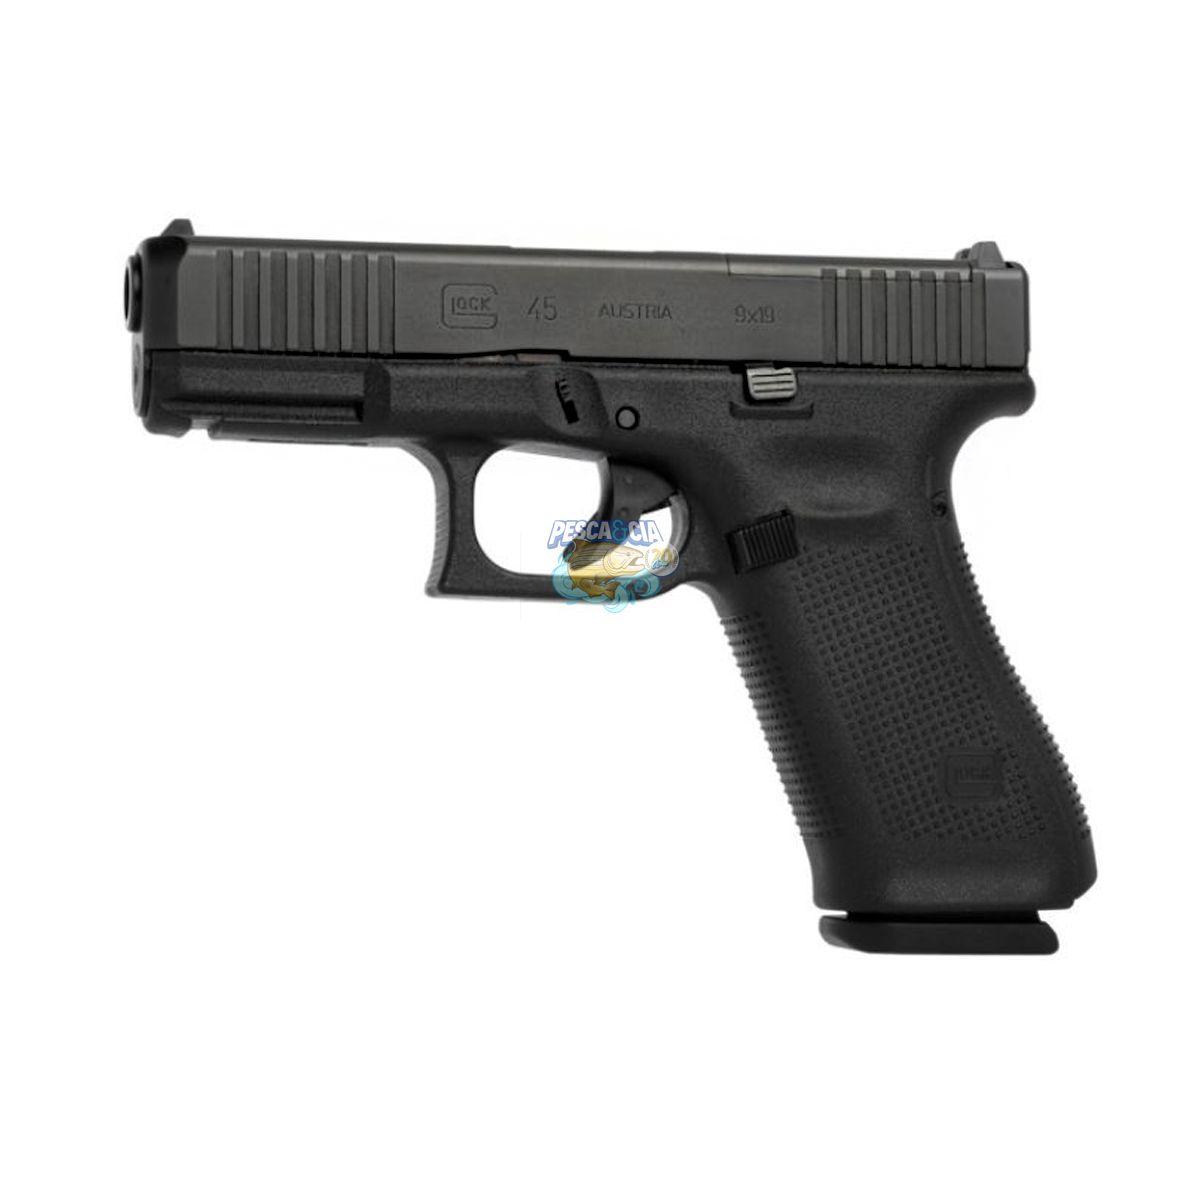 Pistola Glock G45 Gen5 MOS Cal. 9mm 17 Tiros